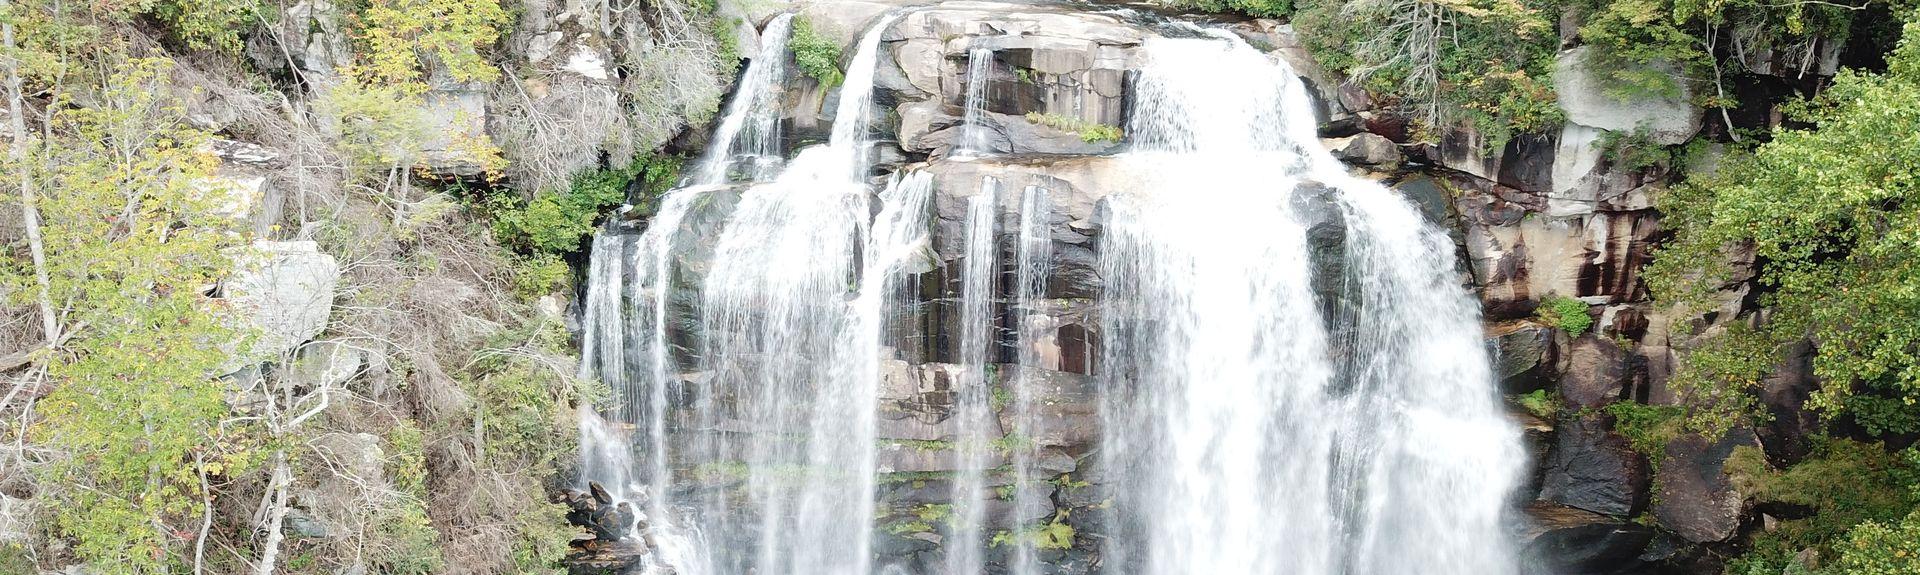 Whisper Lake, Sapphire, North Carolina, United States of America